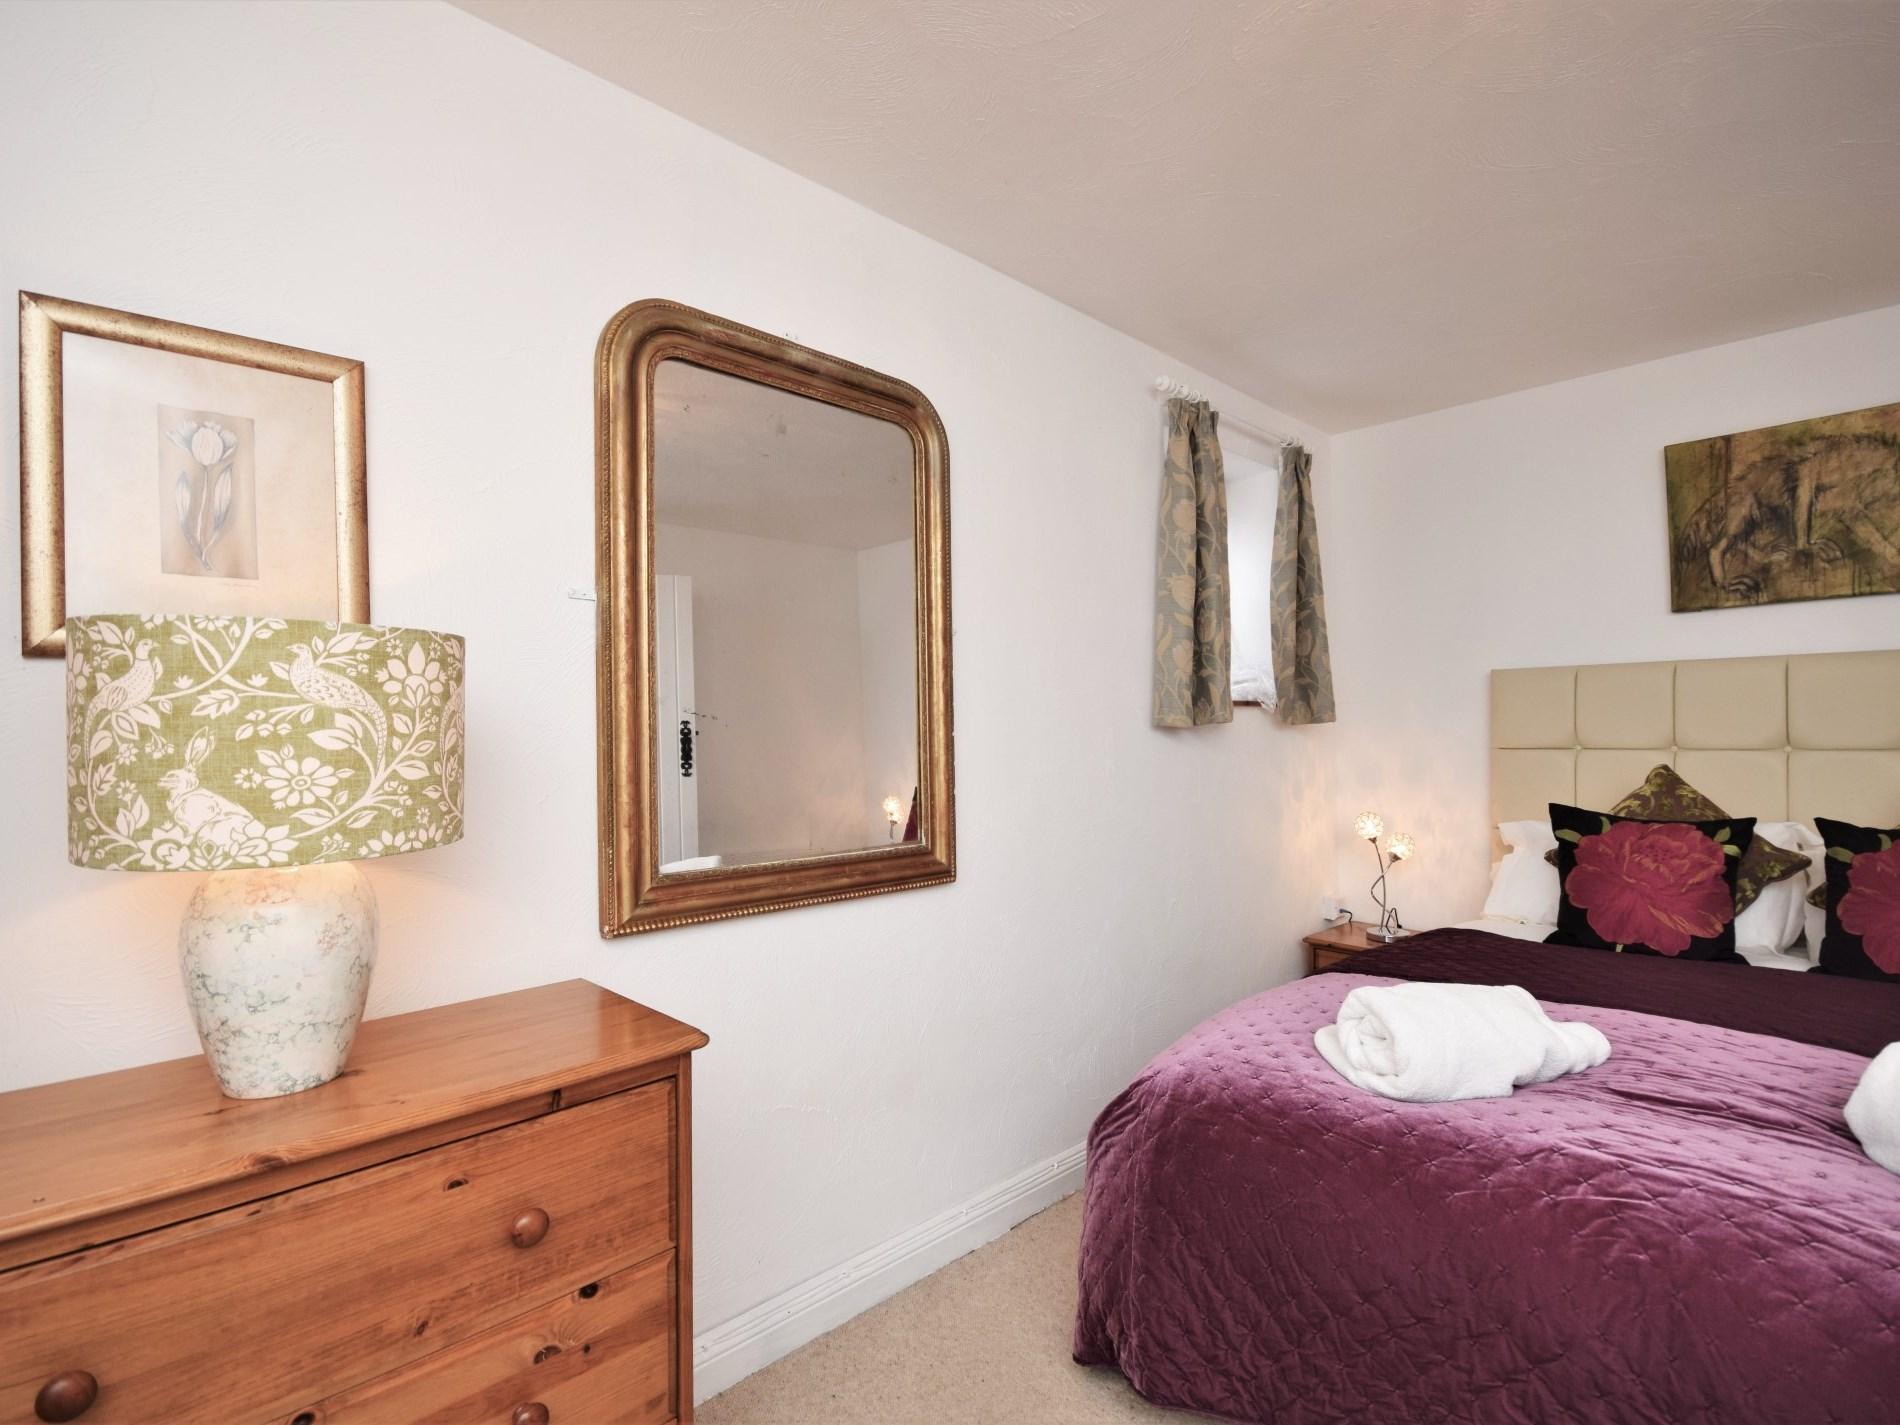 1 Bedroom Barn in North Devon, Cornwall